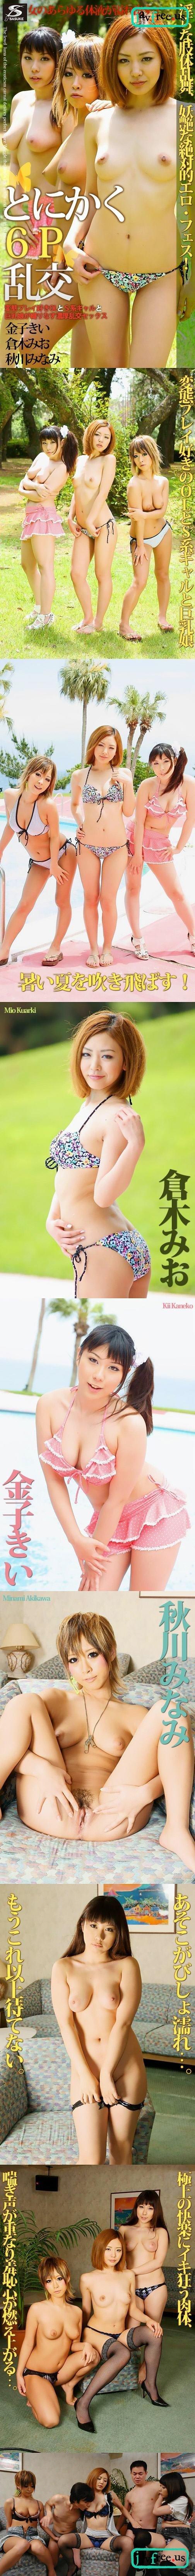 [SSKP-017] Sasuke Premium Vol.17 : Mio Kuraki, Minami Akikawa, Kii Kaneko - image SSKP-017a on https://javfree.me